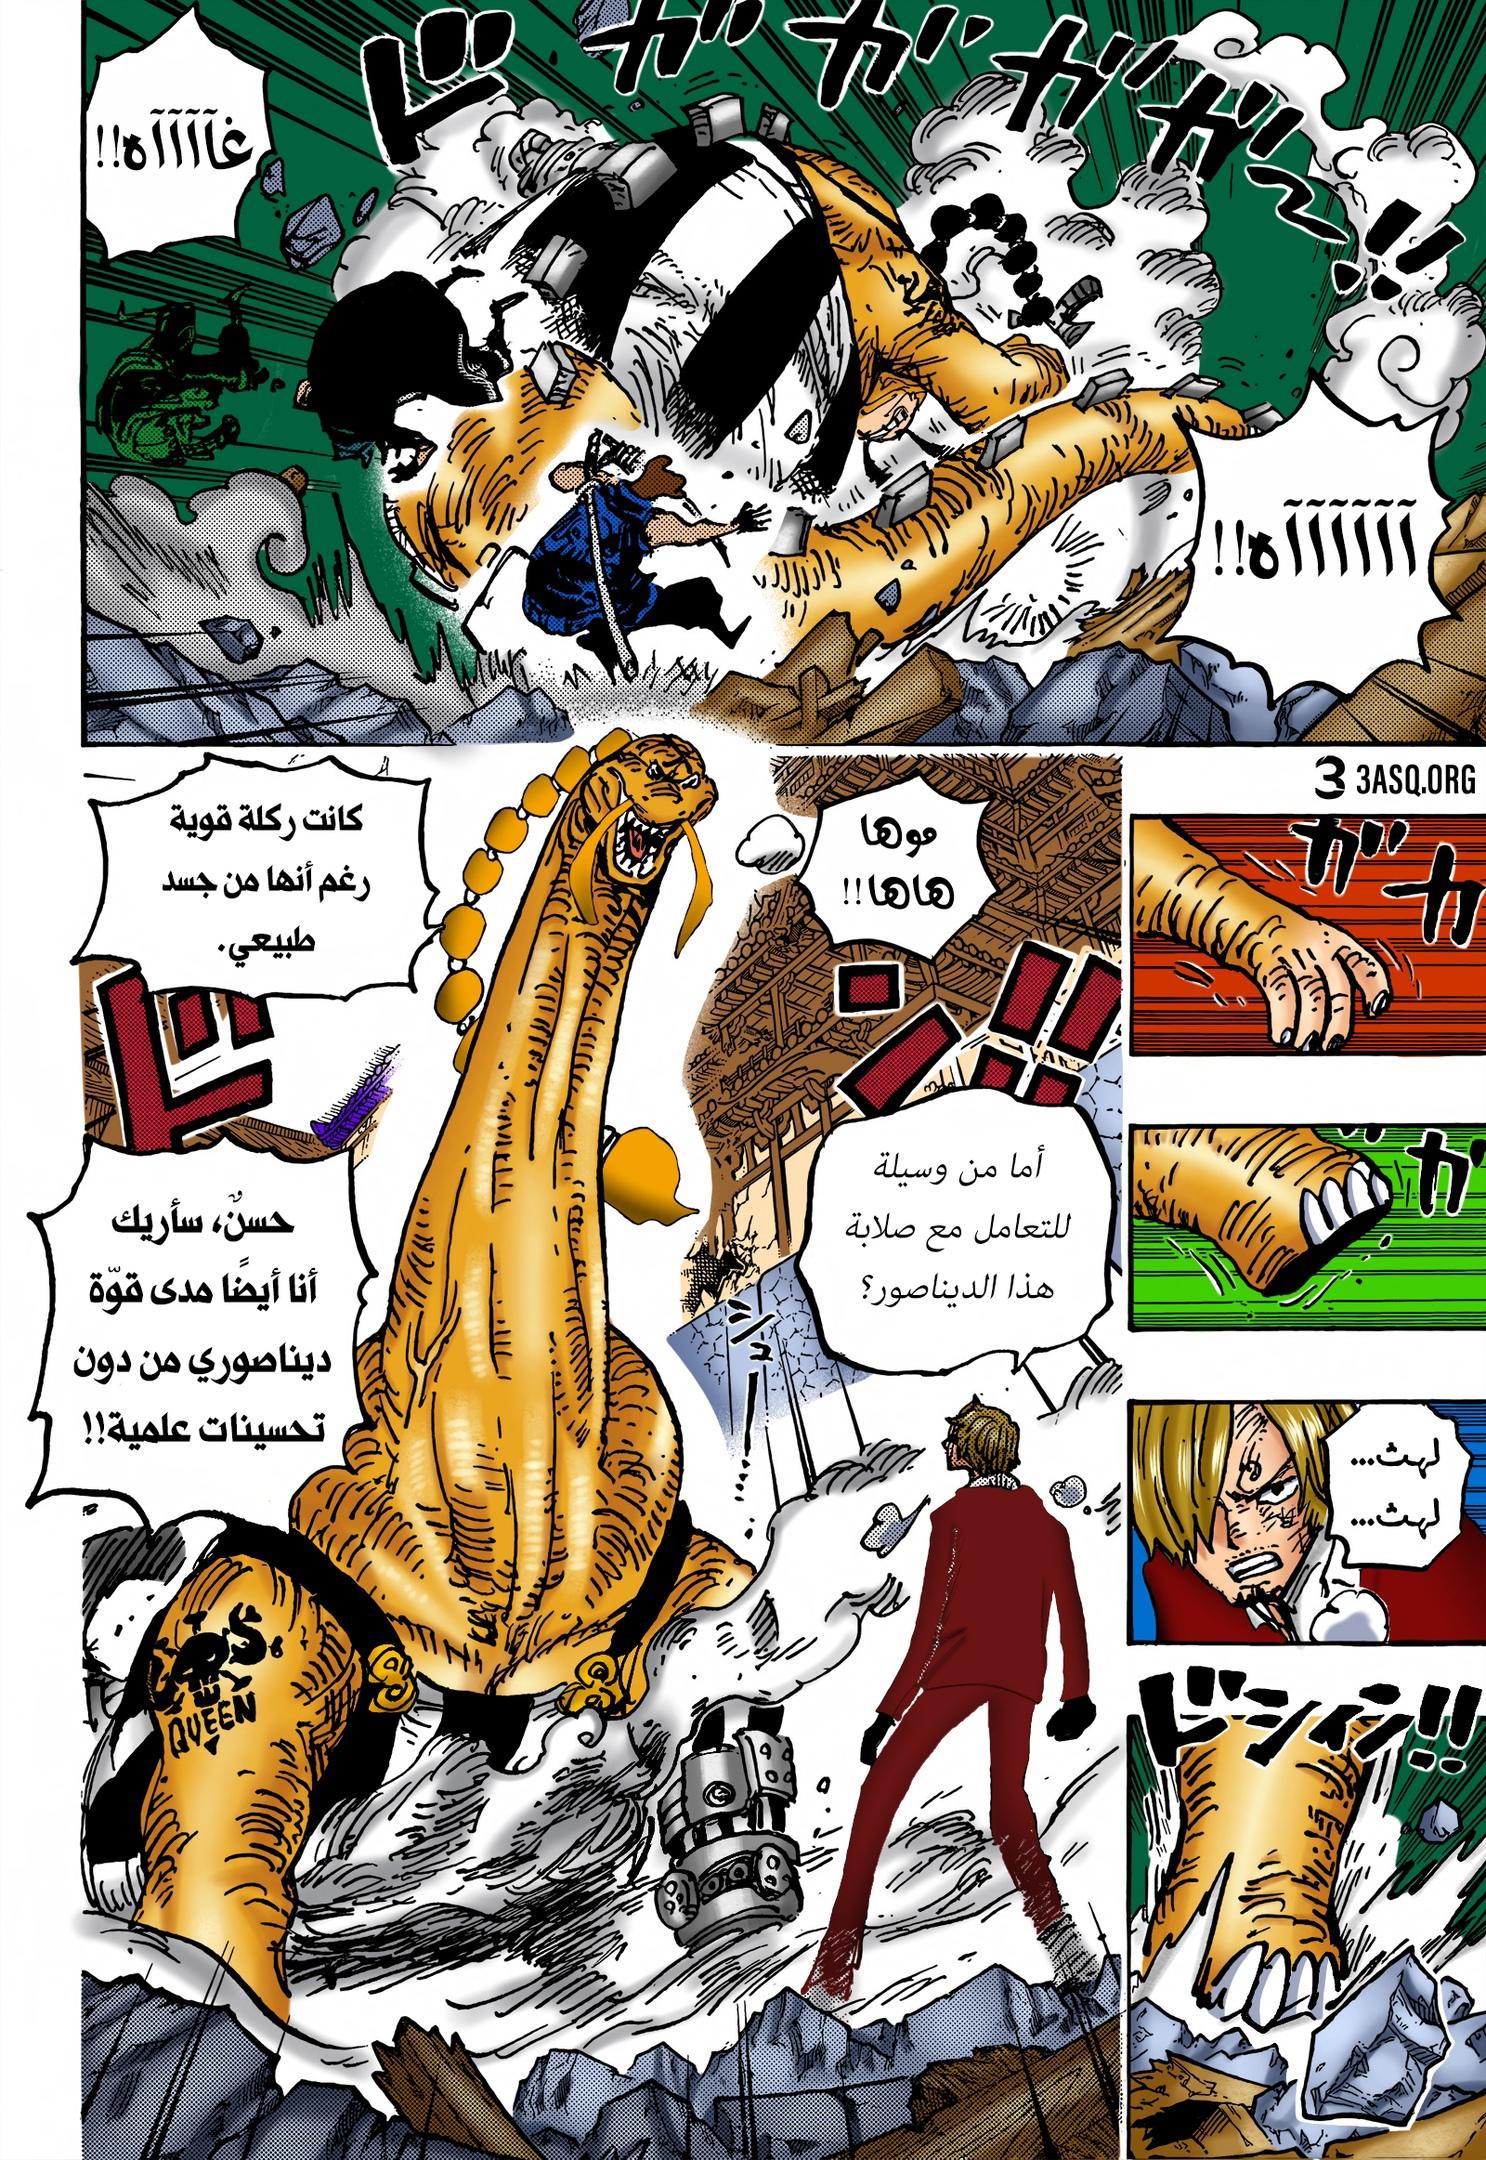 Arab One Piece 1028, image №20